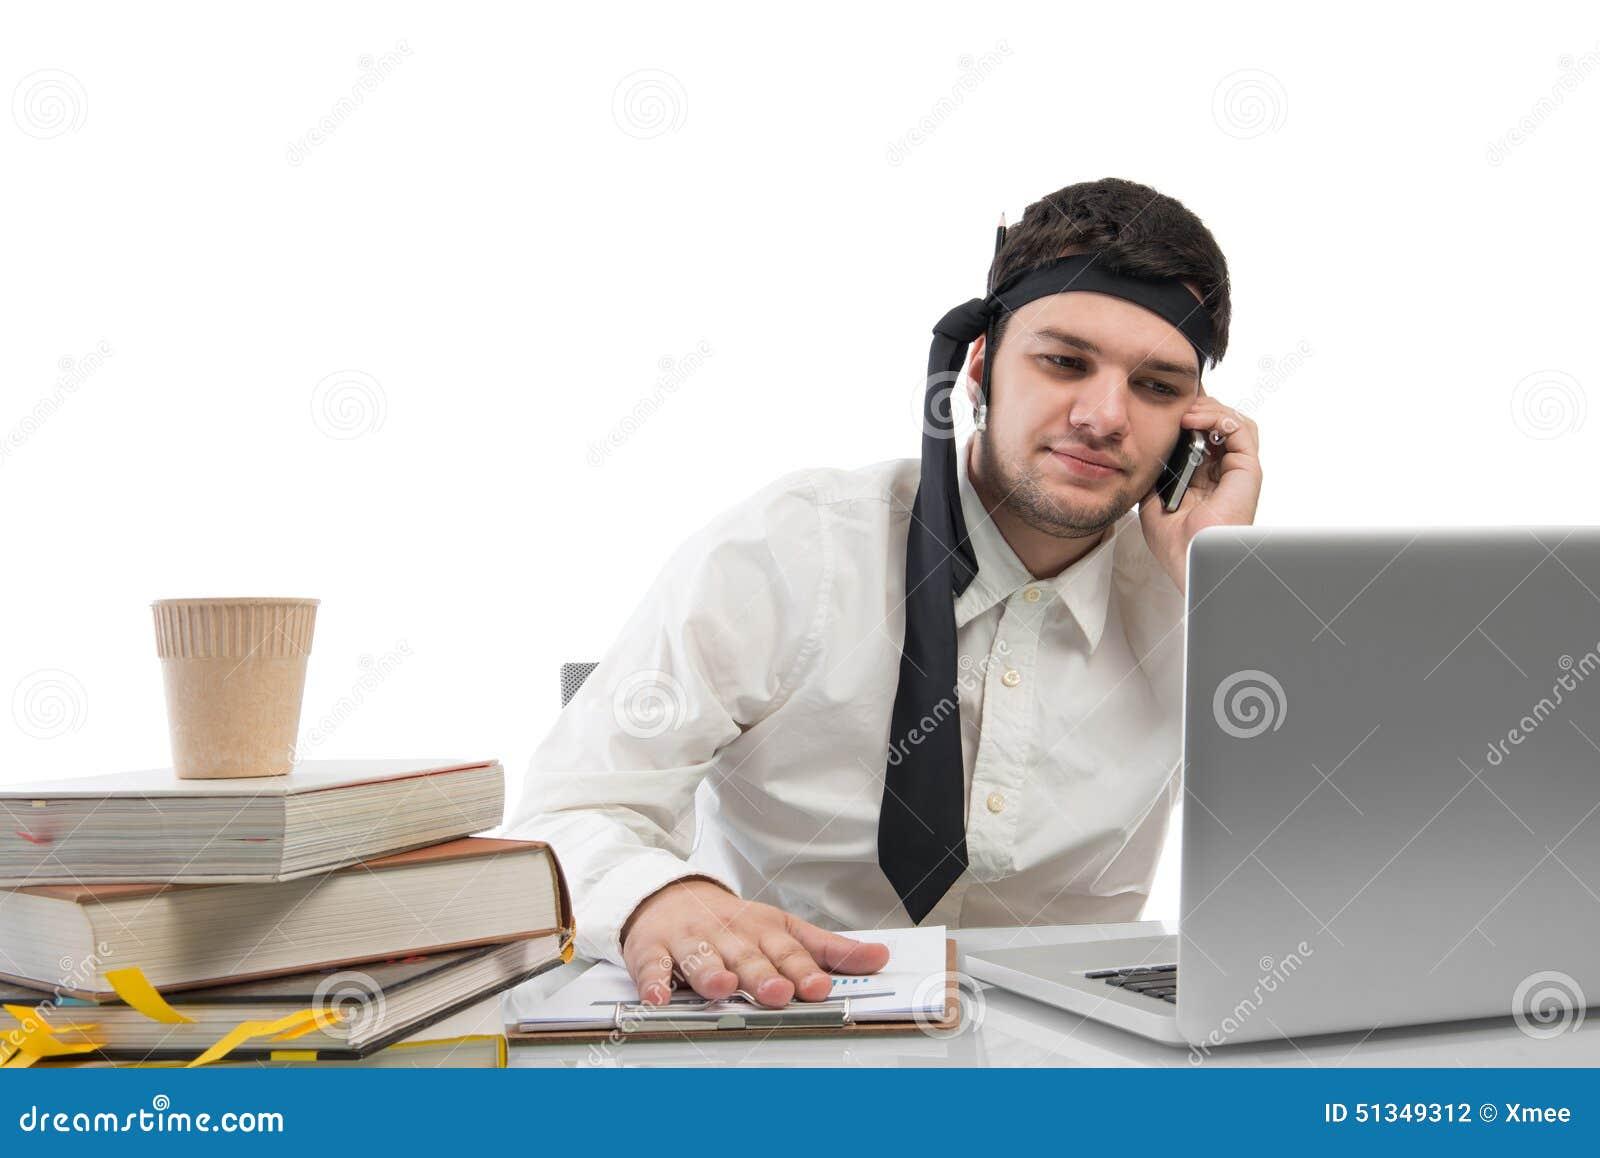 Hard Working Stock Photo - Image: 51349312